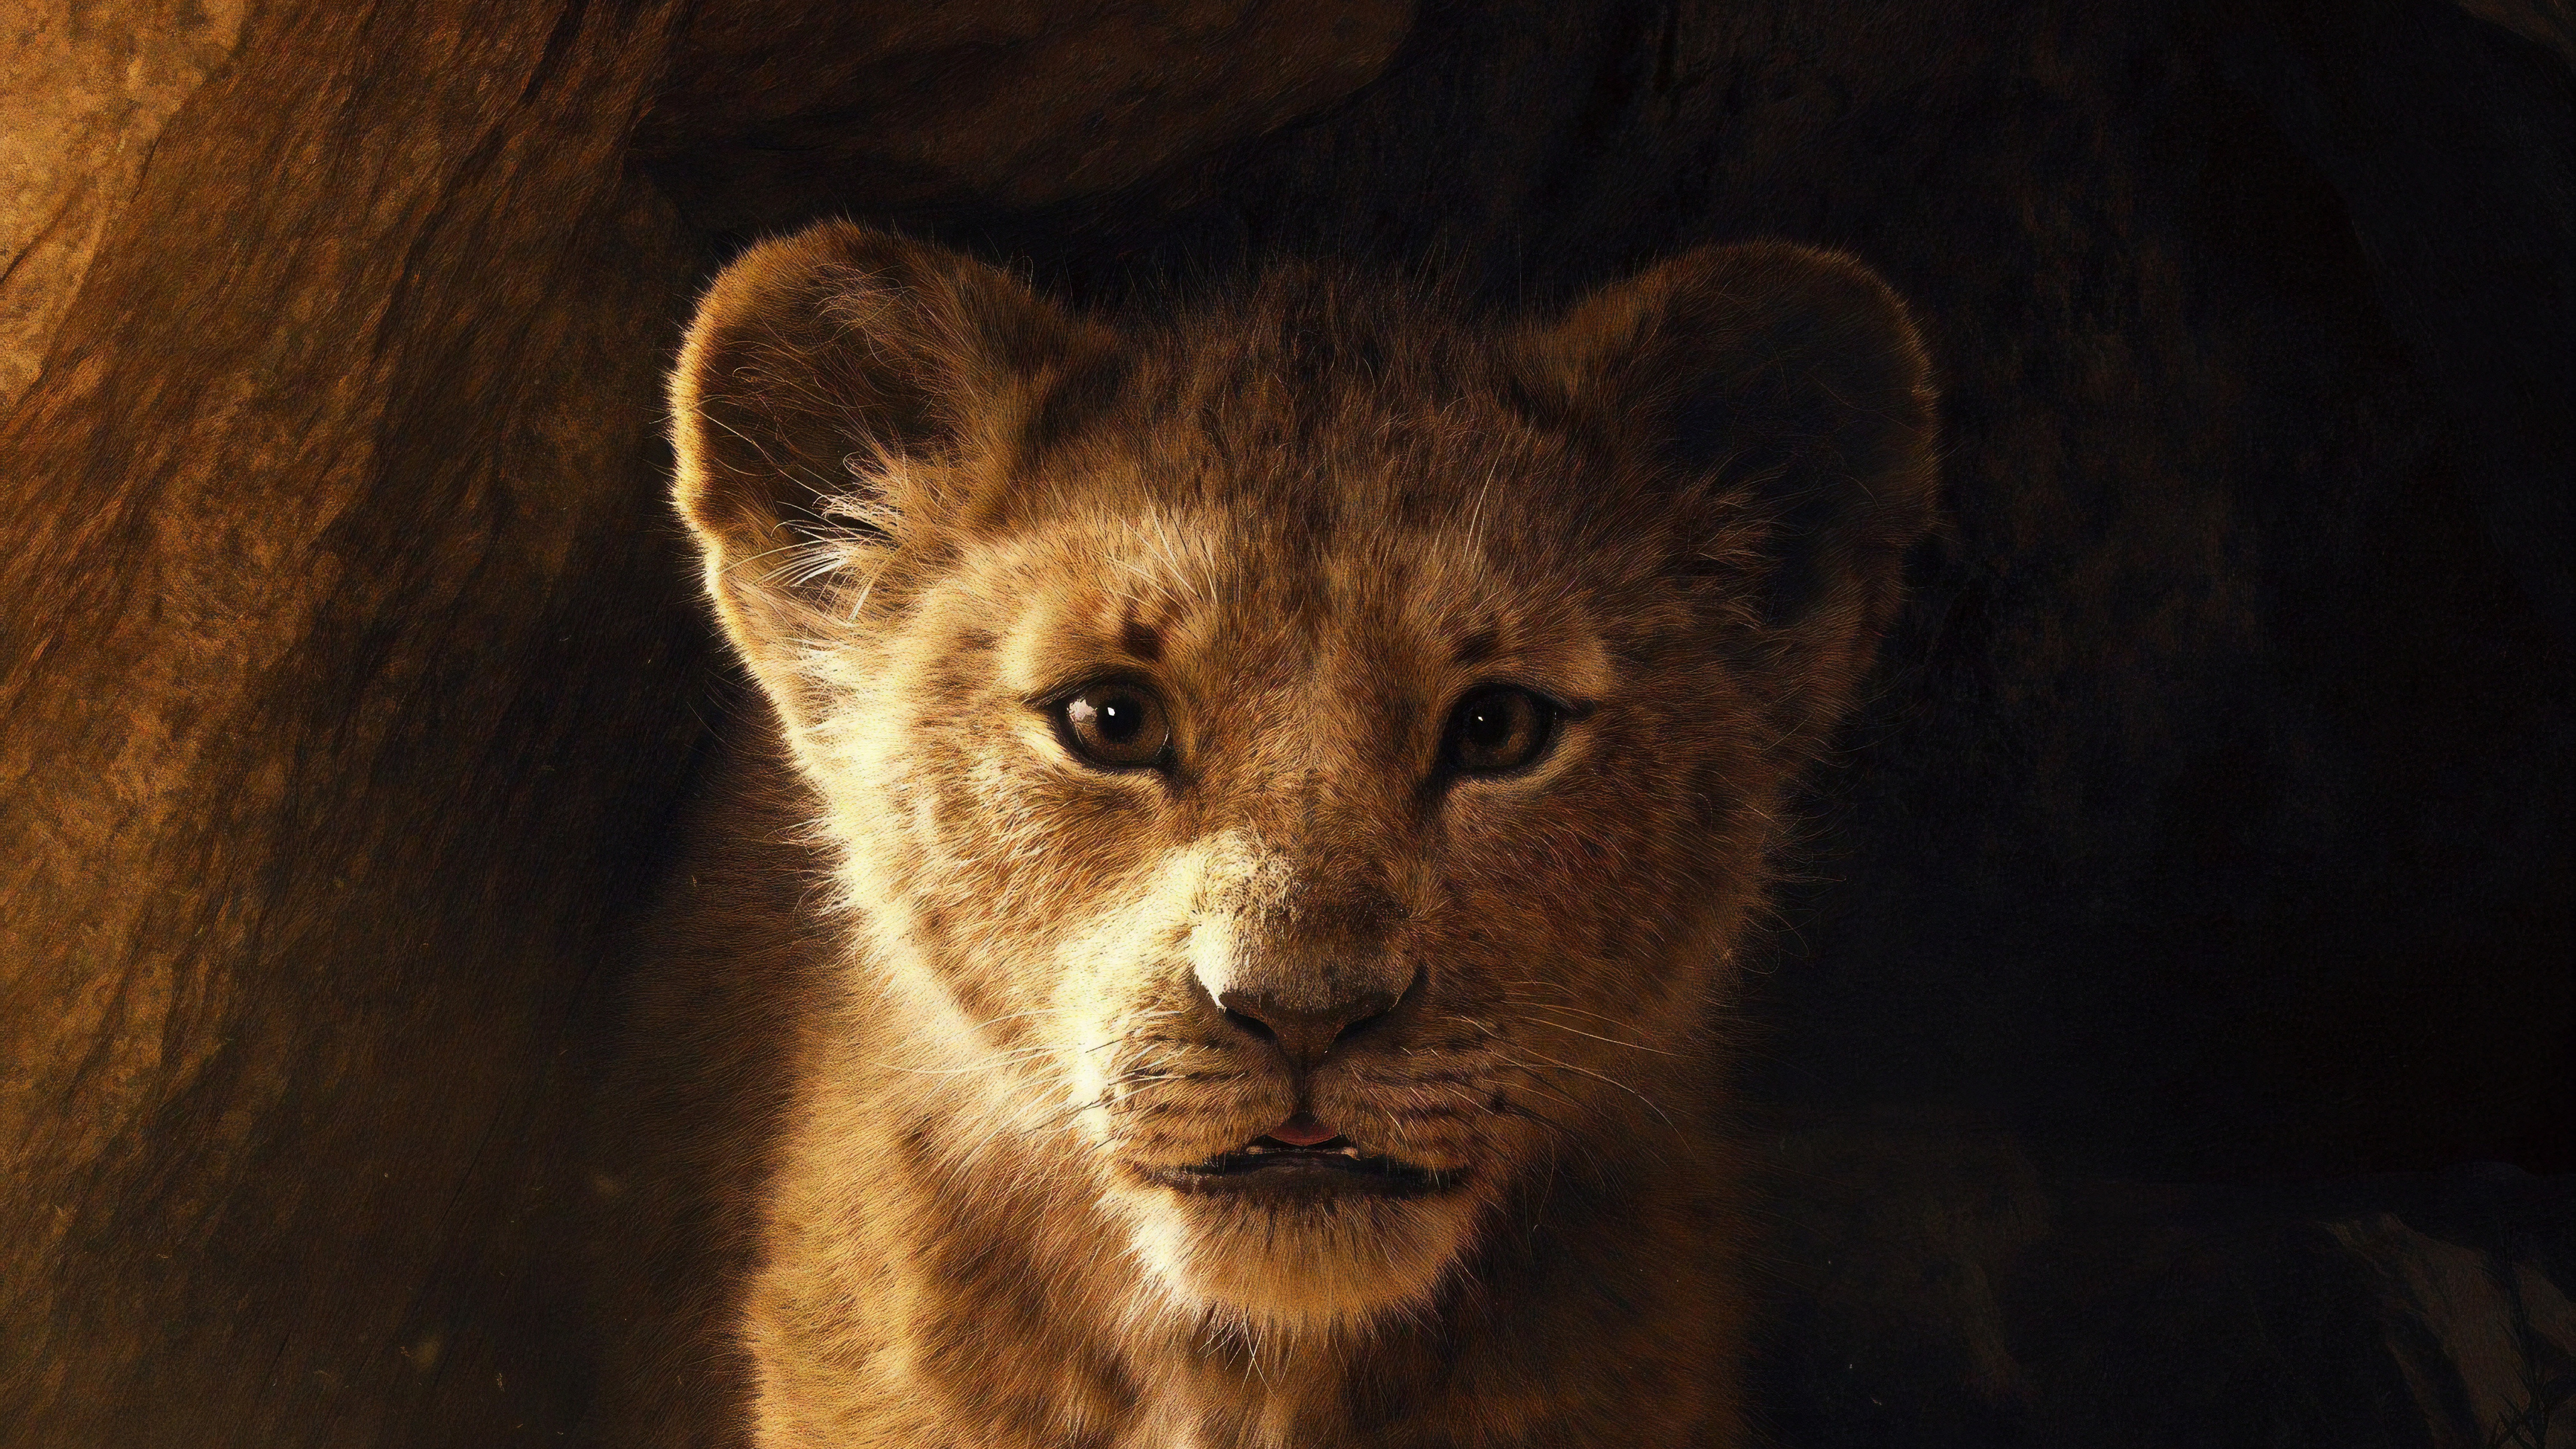 the lion king 2019 4k 1543105503 - The Lion King 2019 4k - the lion king wallpapers, movies wallpapers, lion wallpapers, hd-wallpapers, disney wallpapers, 5k wallpapers, 4k-wallpapers, 2019 movies wallpapers